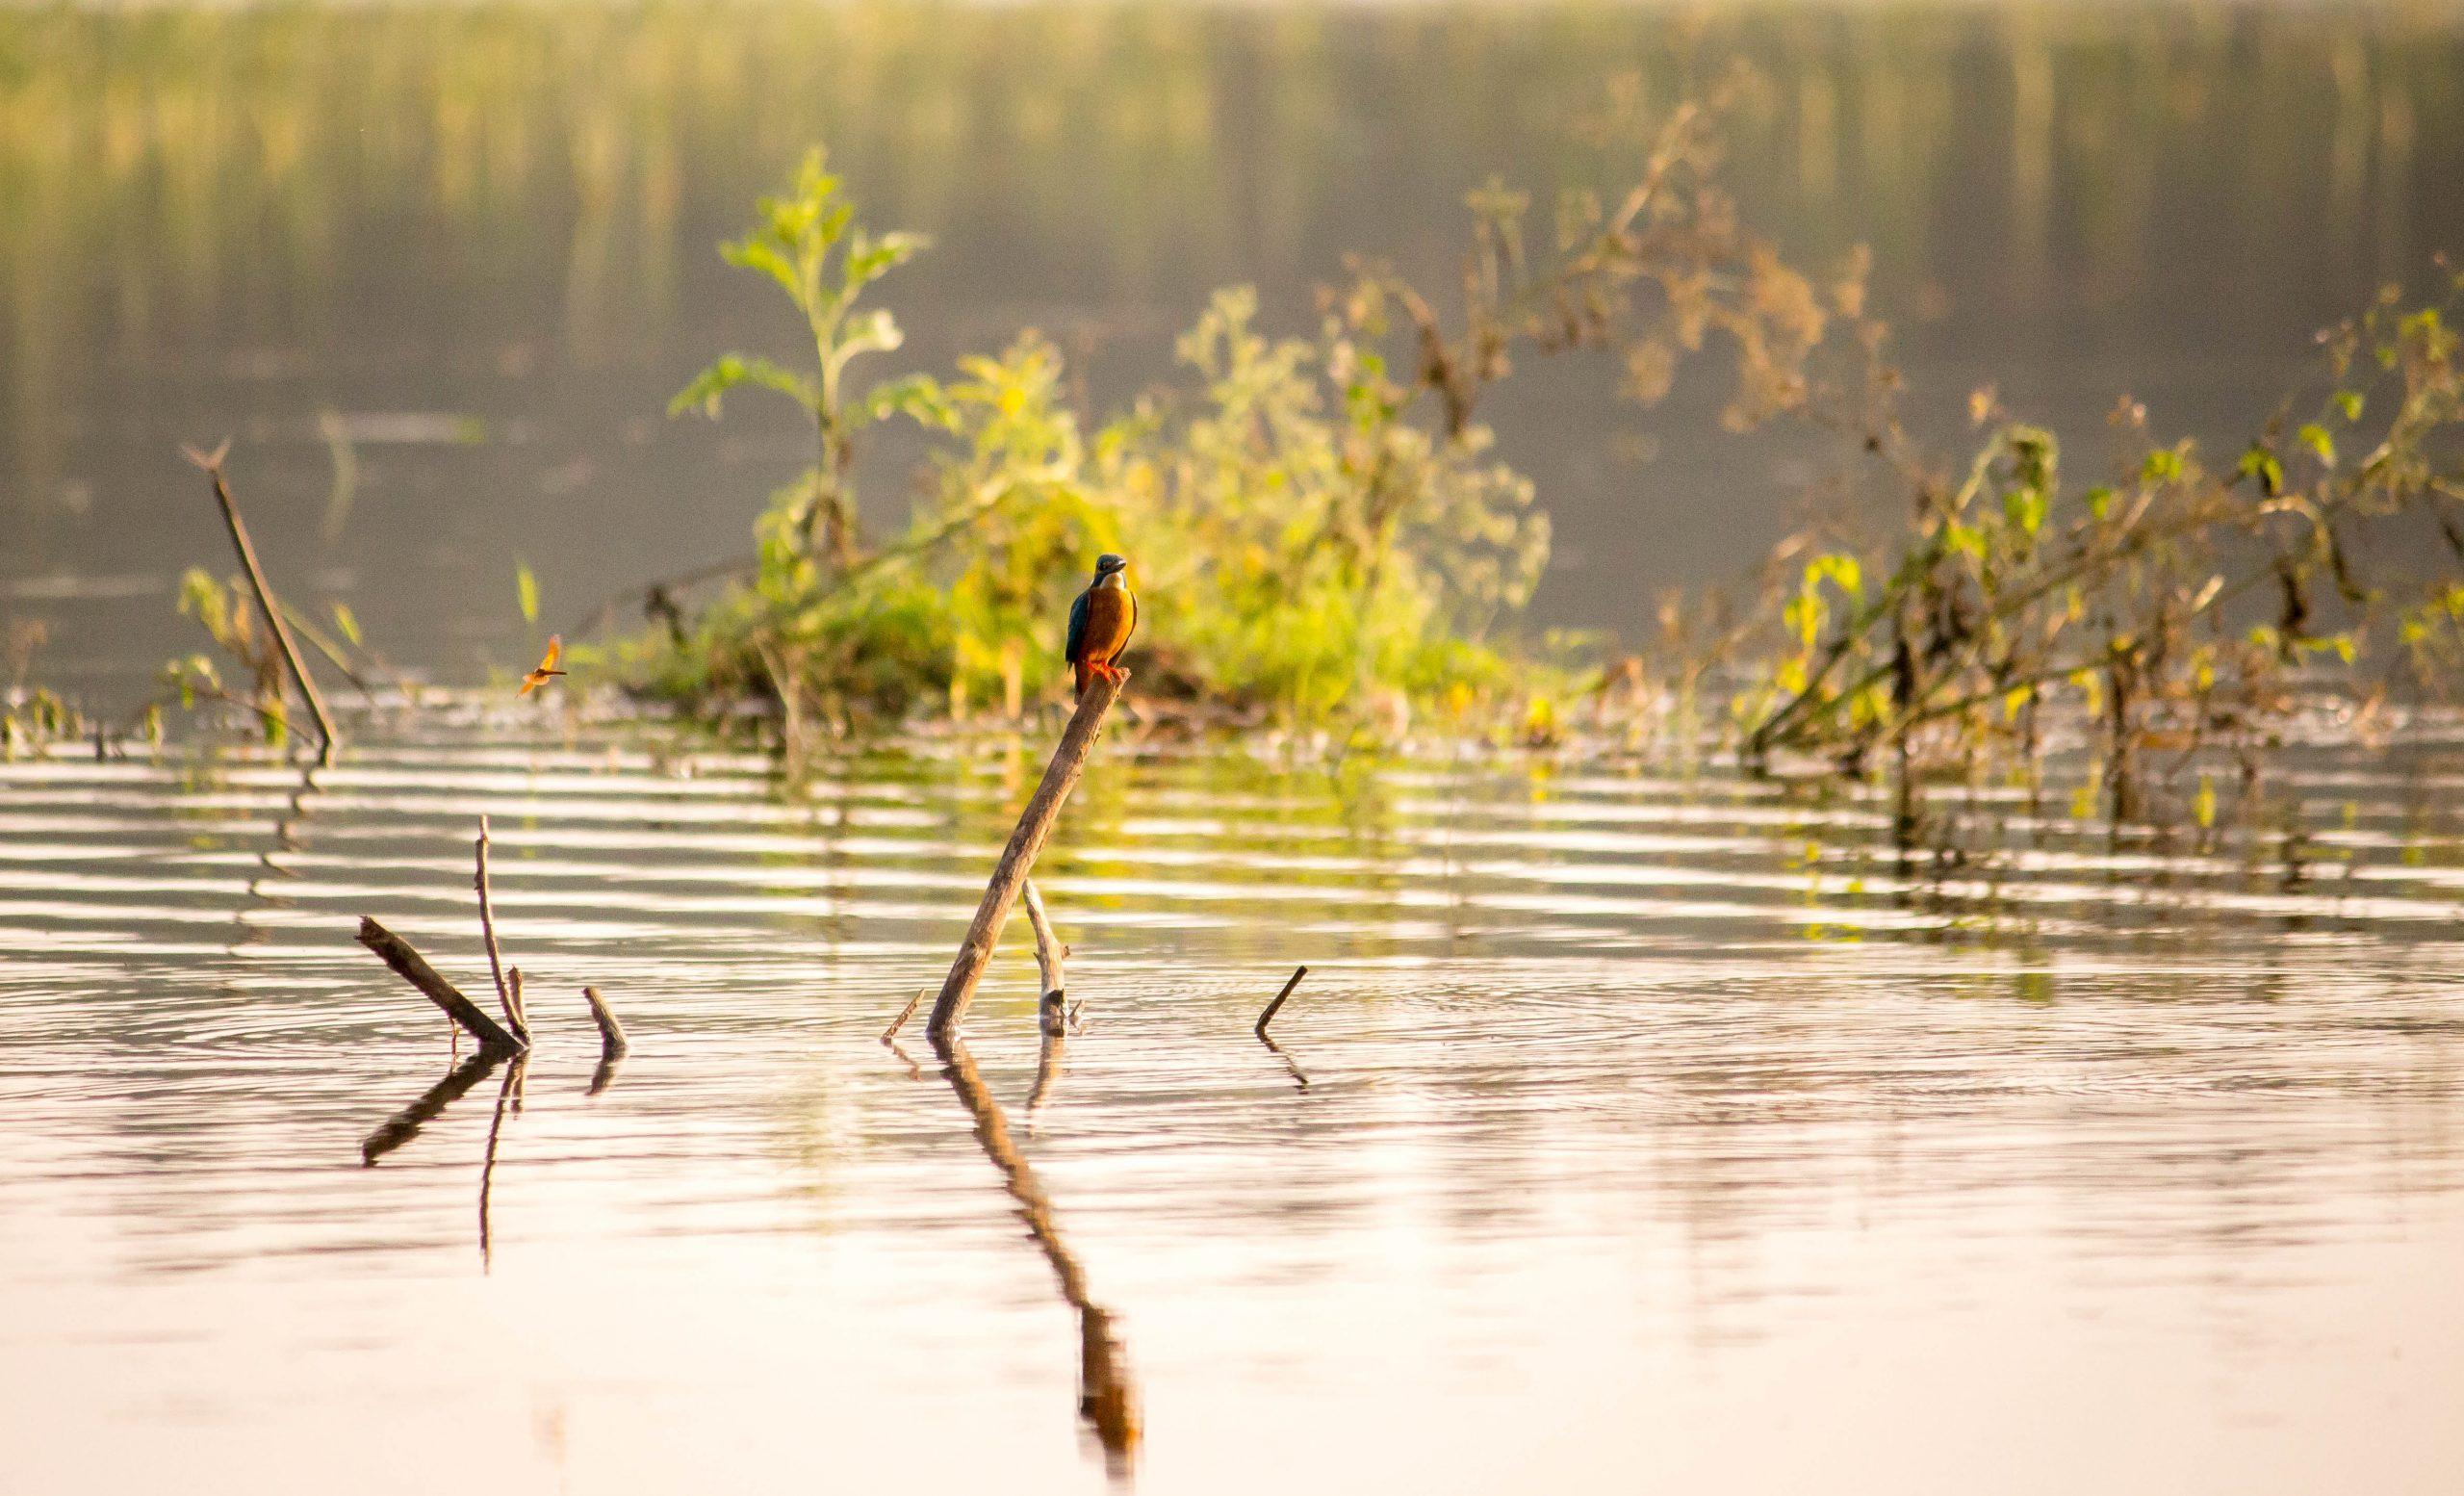 A kingfisher bird on a twig